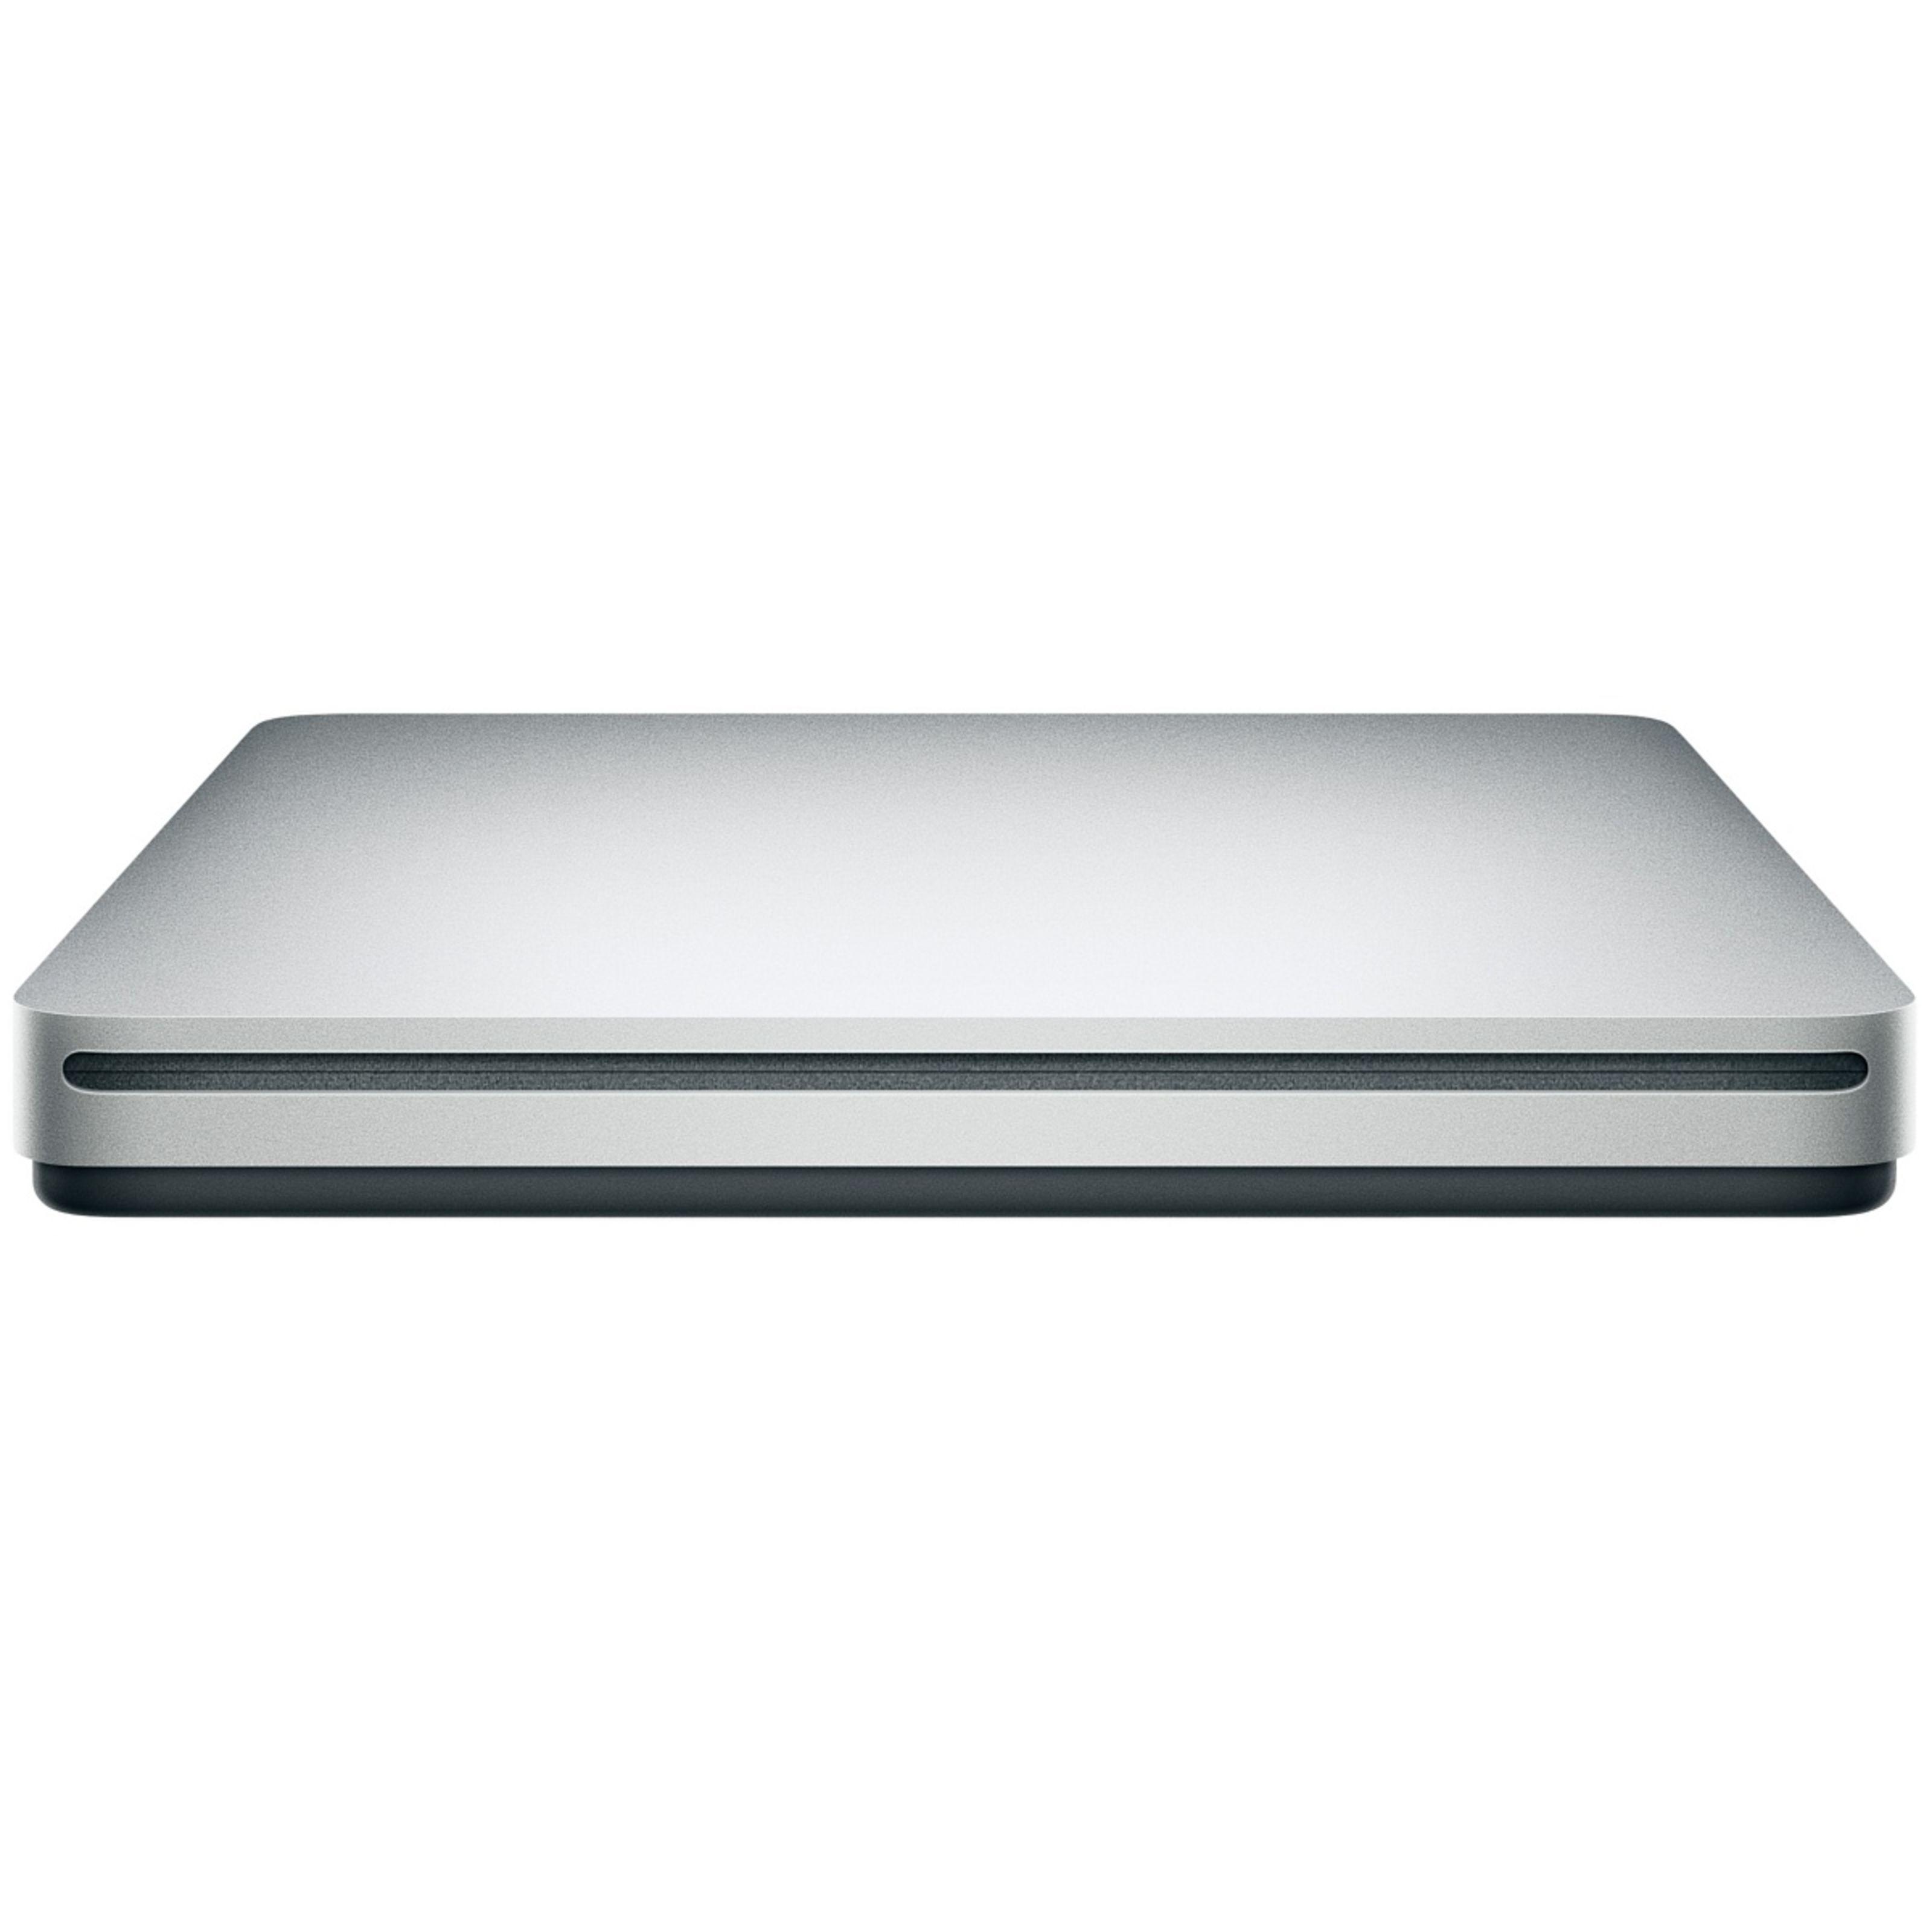 Apple - USB SuperDrive Laufwerk MD564ZM/A